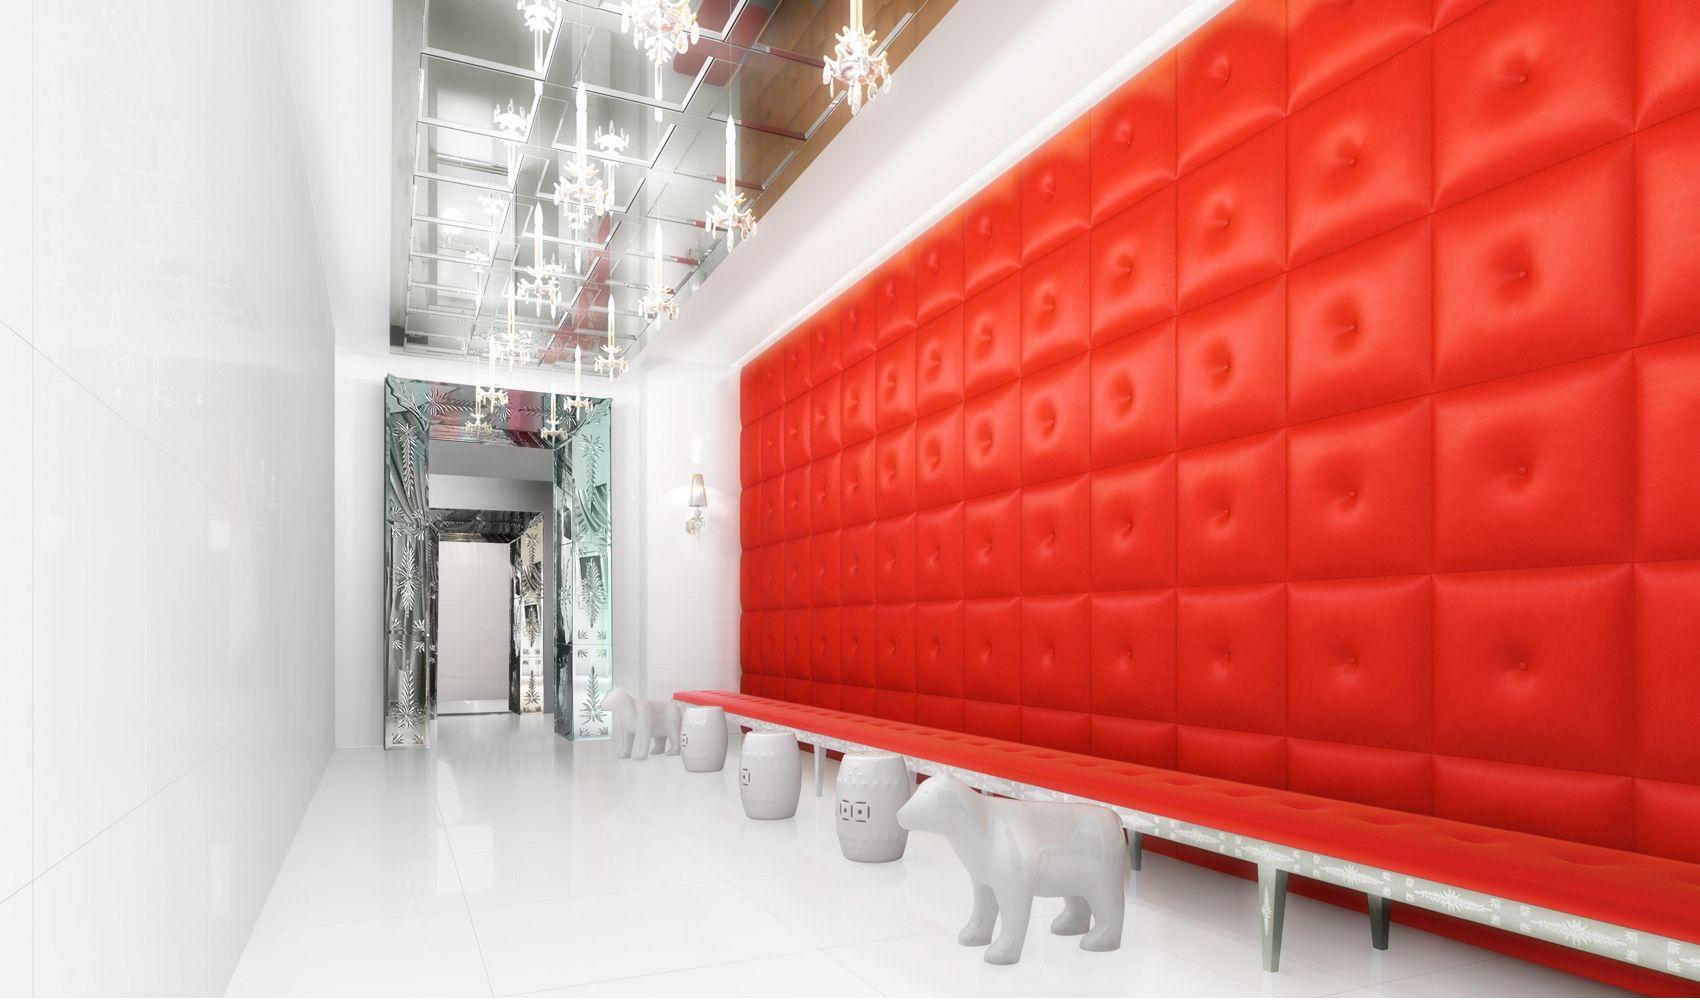 Large yoo berlin lobby 1000 ccf29 designer philippe for Hoteles diseno berlin